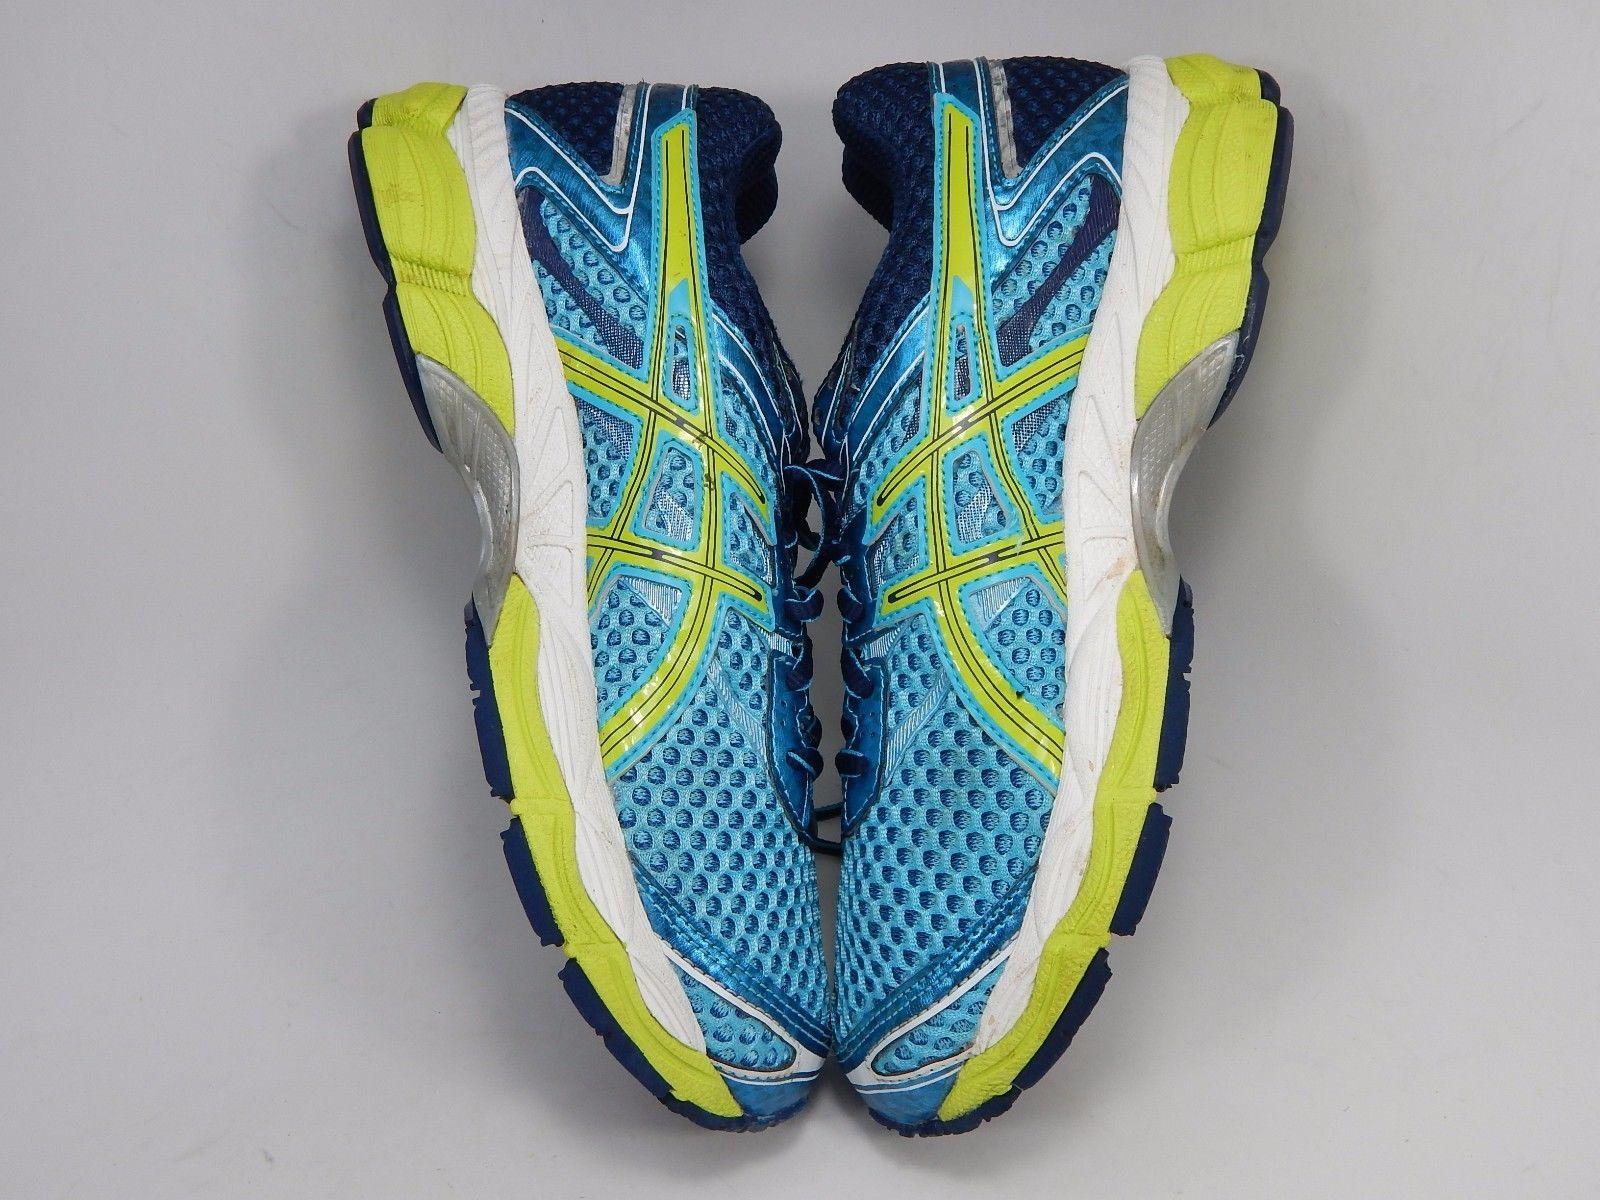 Asics Gel Cumulus 16 Women's Running Shoes Size US 7.5 D WIDE EU 39 Blue T490N